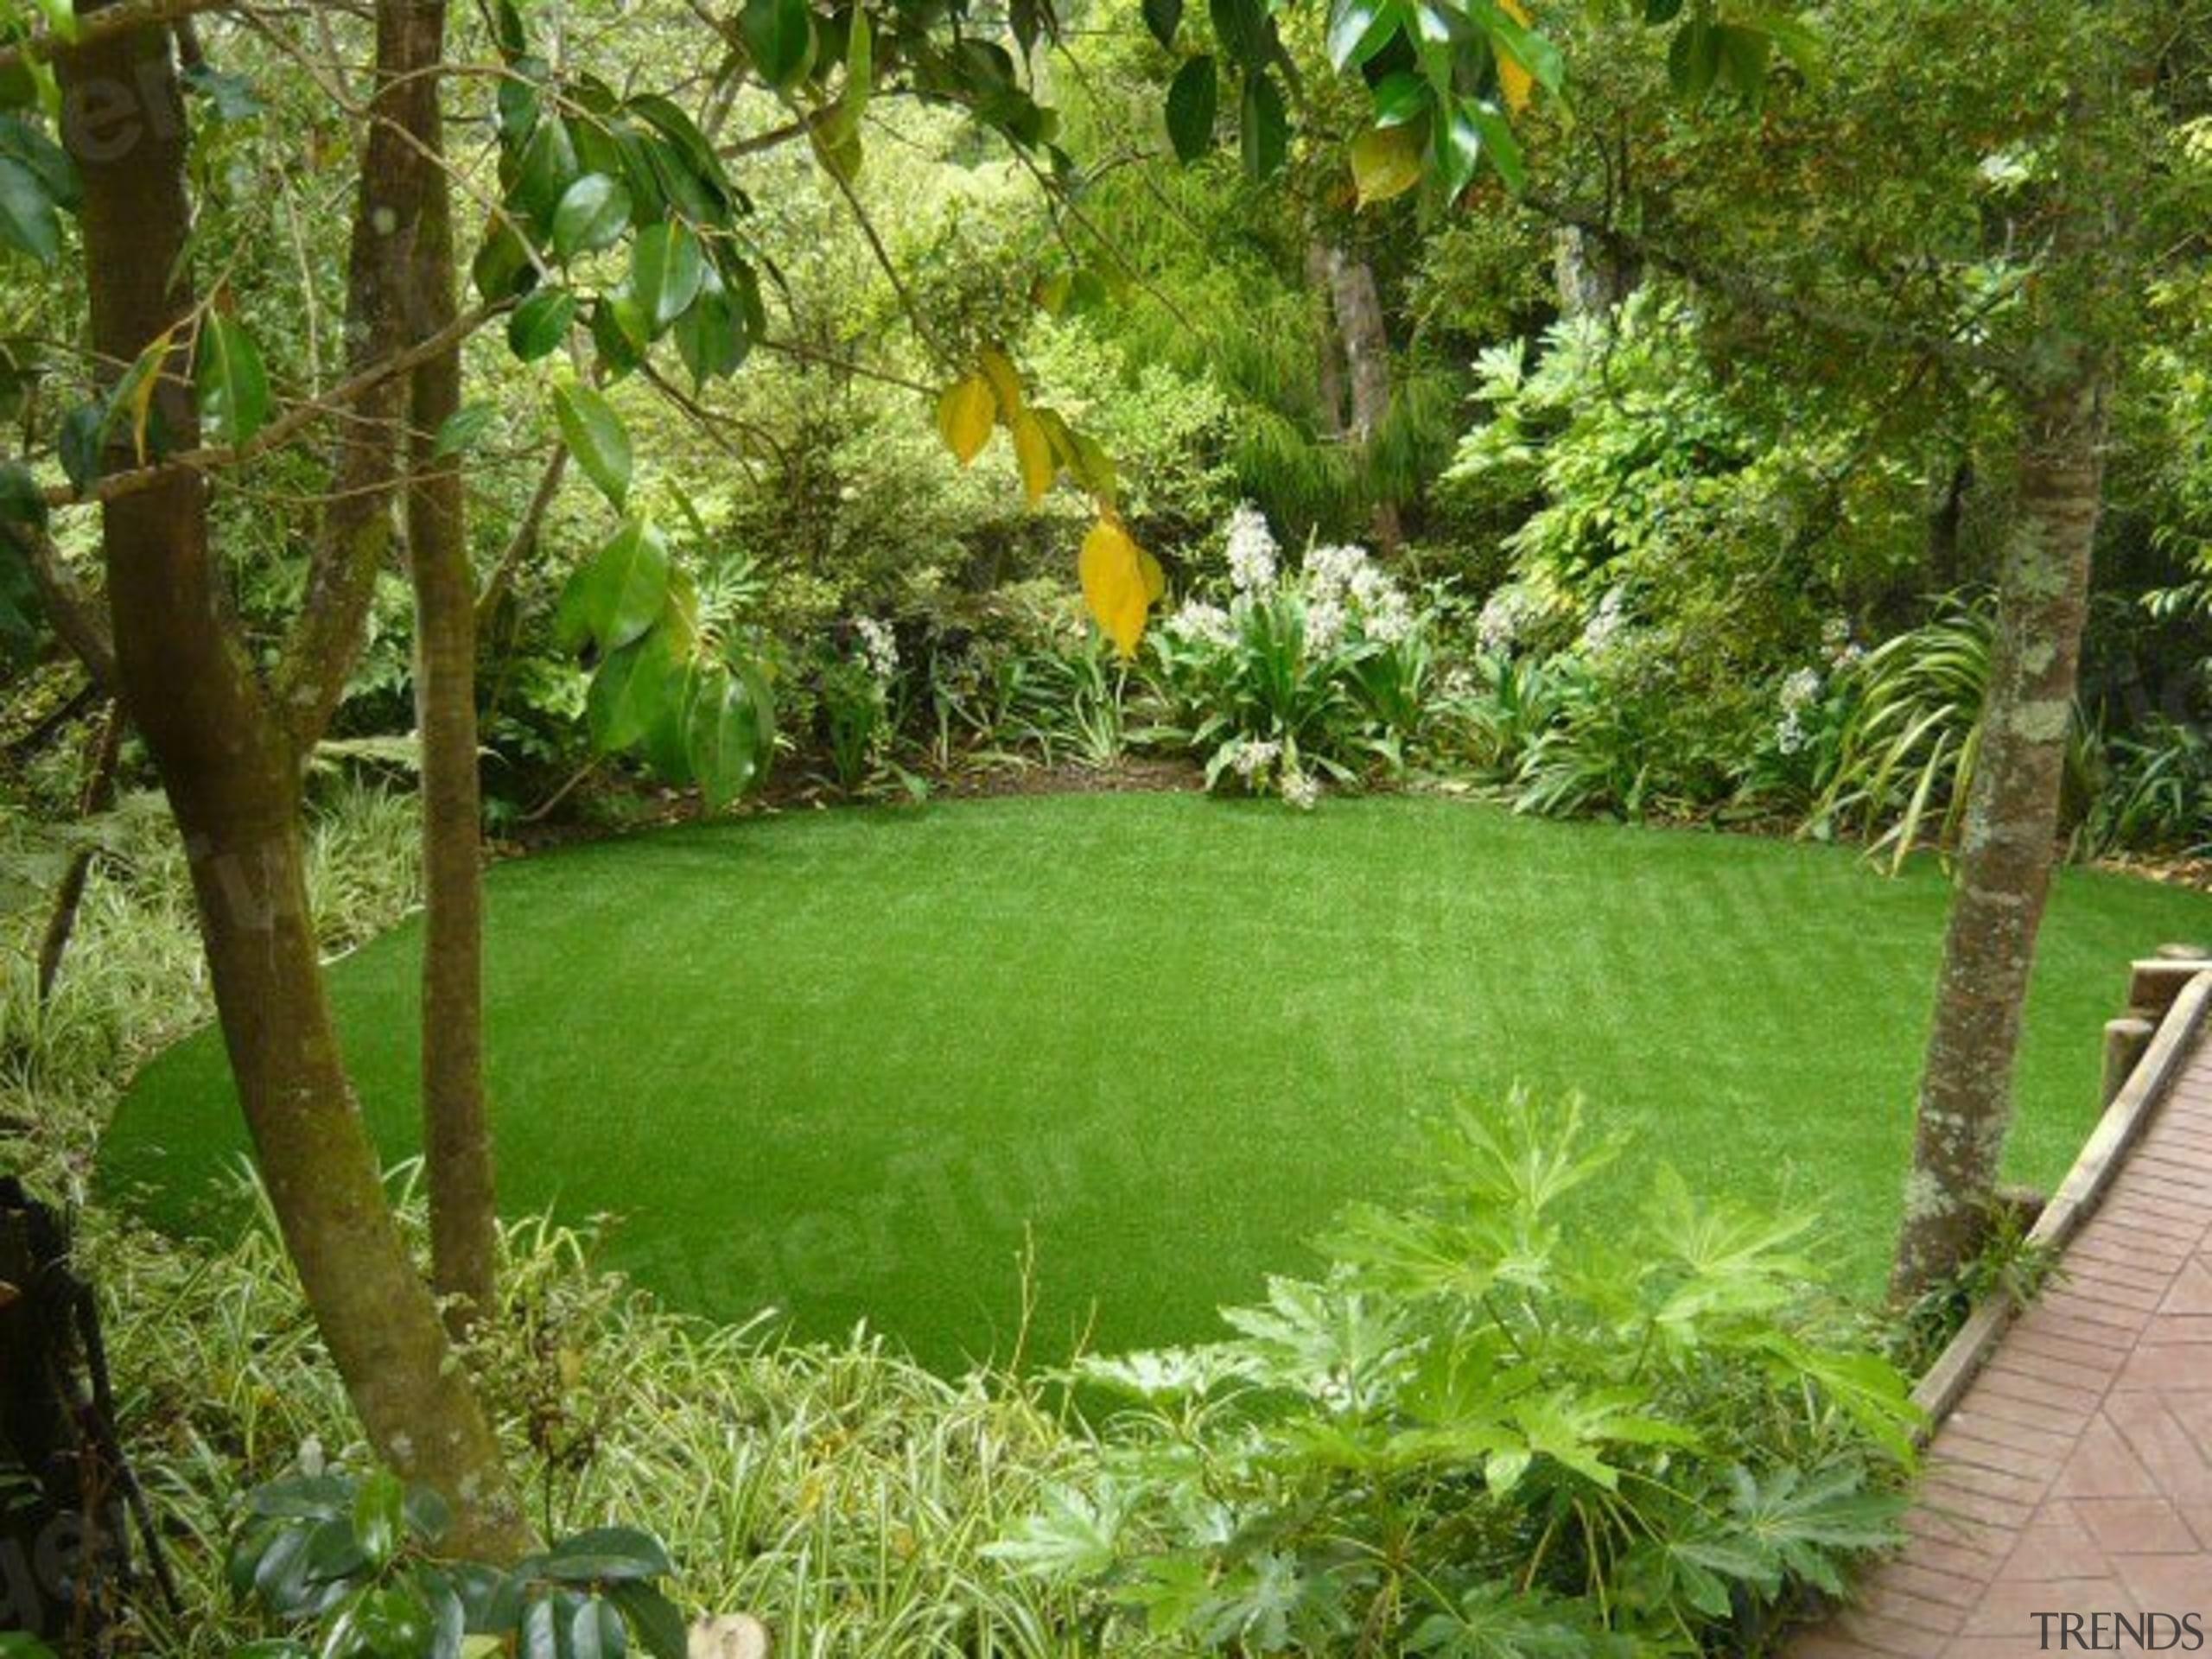 7B088 Wmhansen After - biome | botanical garden biome, botanical garden, ecosystem, garden, grass, lawn, nature reserve, plant, tree, vegetation, yard, green, brown